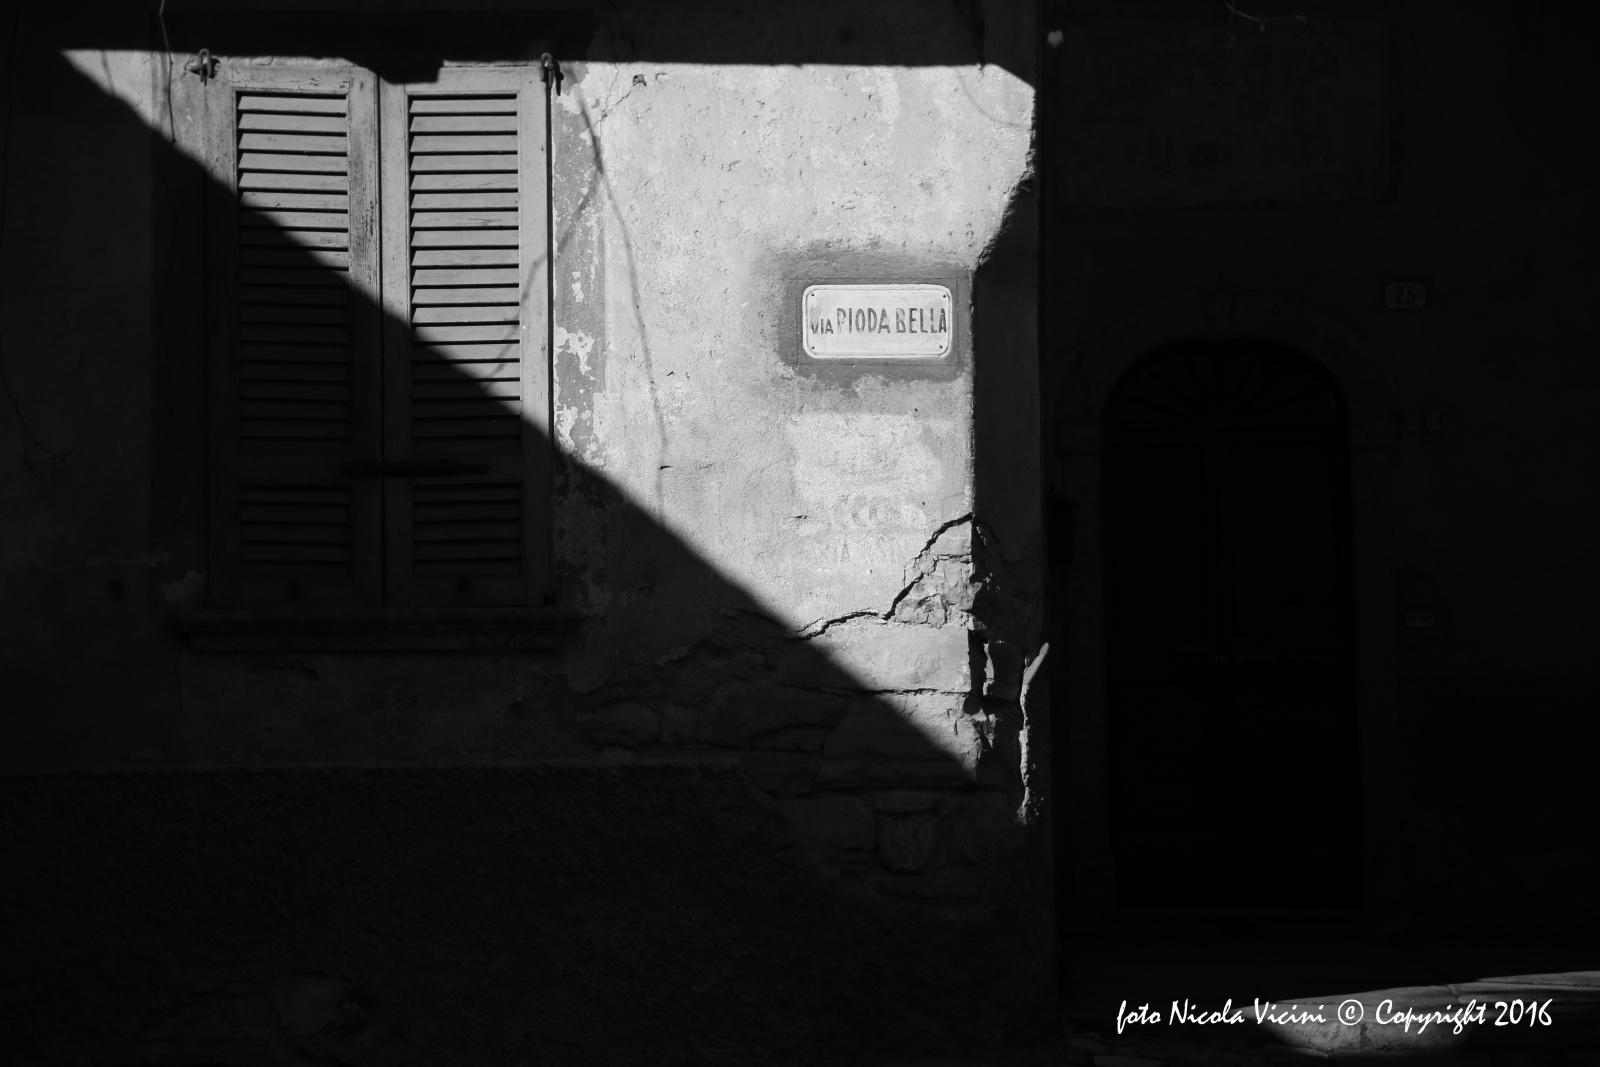 Strada Regia, Faggeto - Palanzo - Pognana